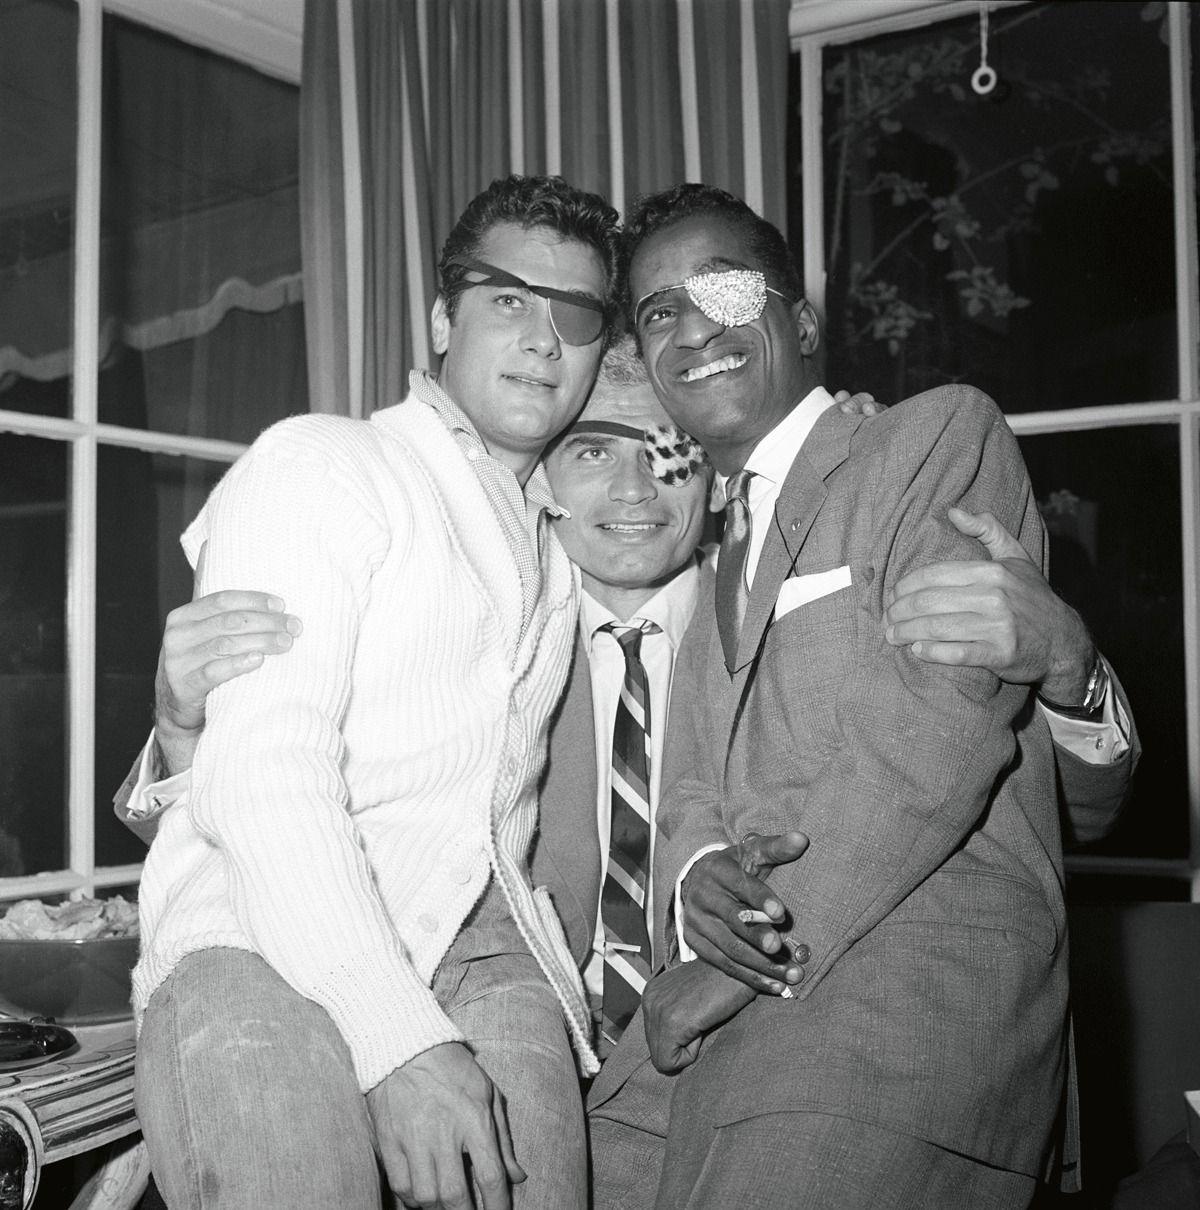 Sammy Davis Tony Curtis Anniversaire L'1so- Où Ai-Je La Tête ?